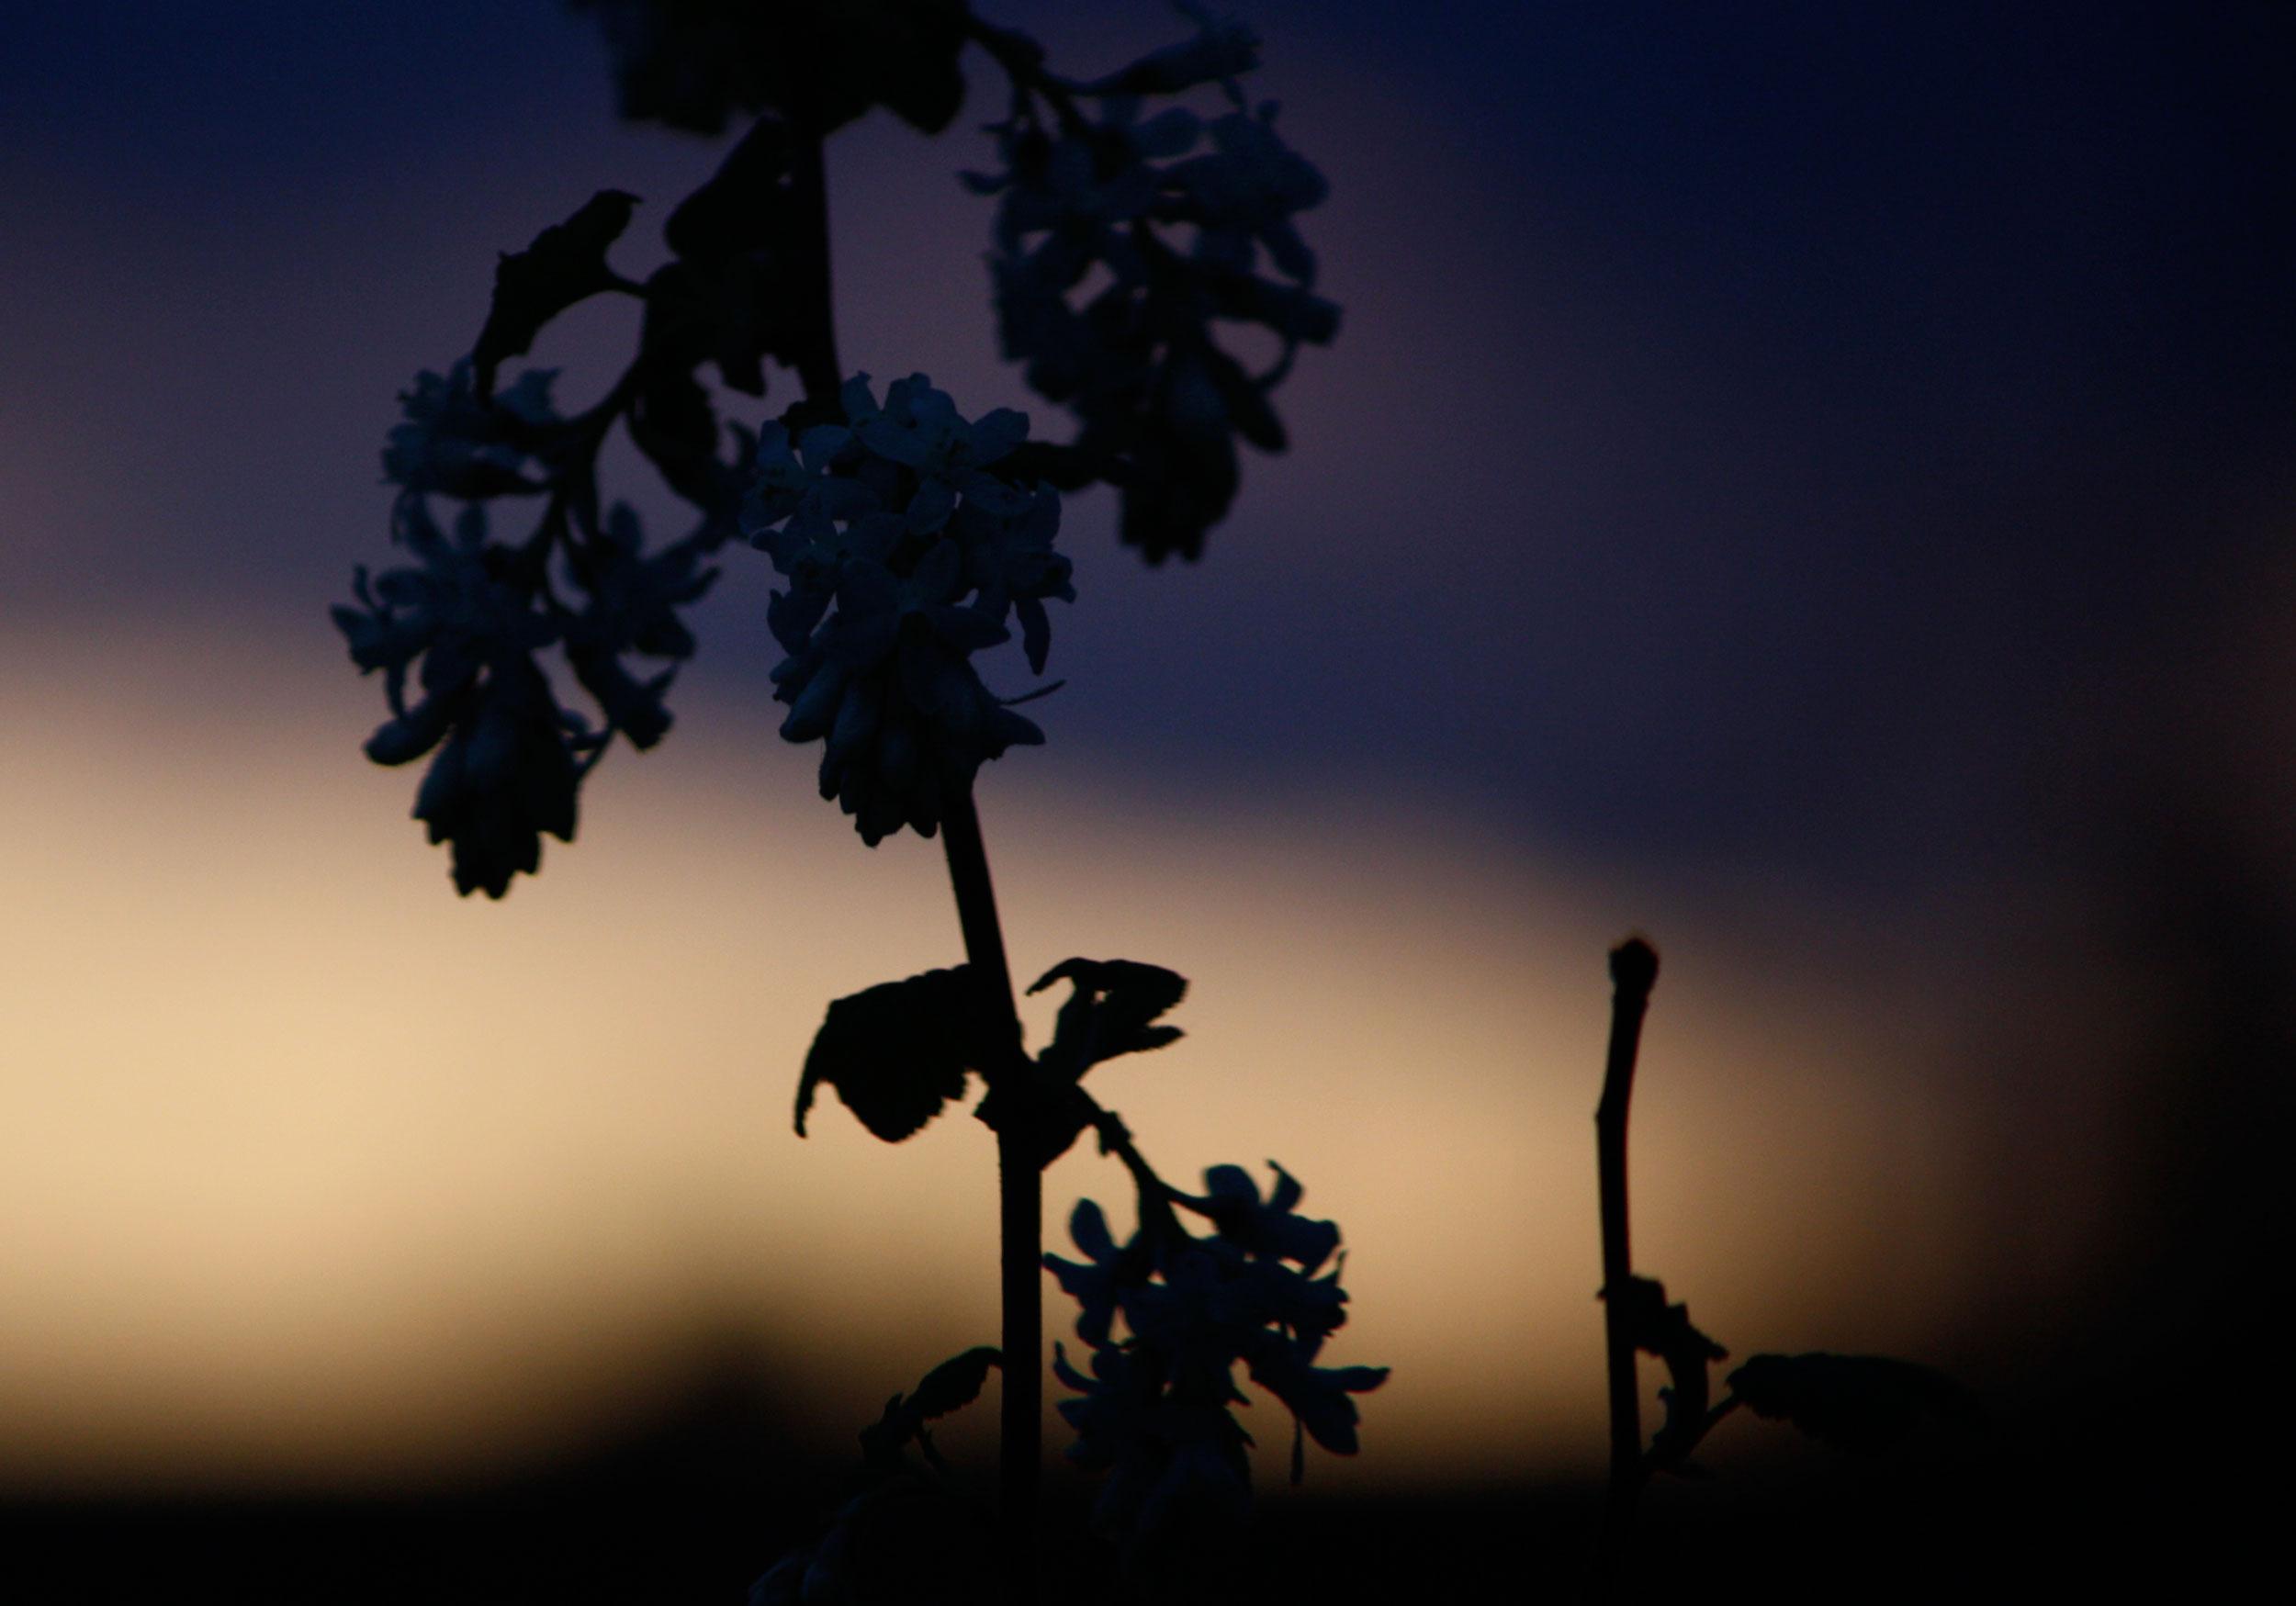 Cool-Blue-Evening-Light-Silhouette-1_web.jpg